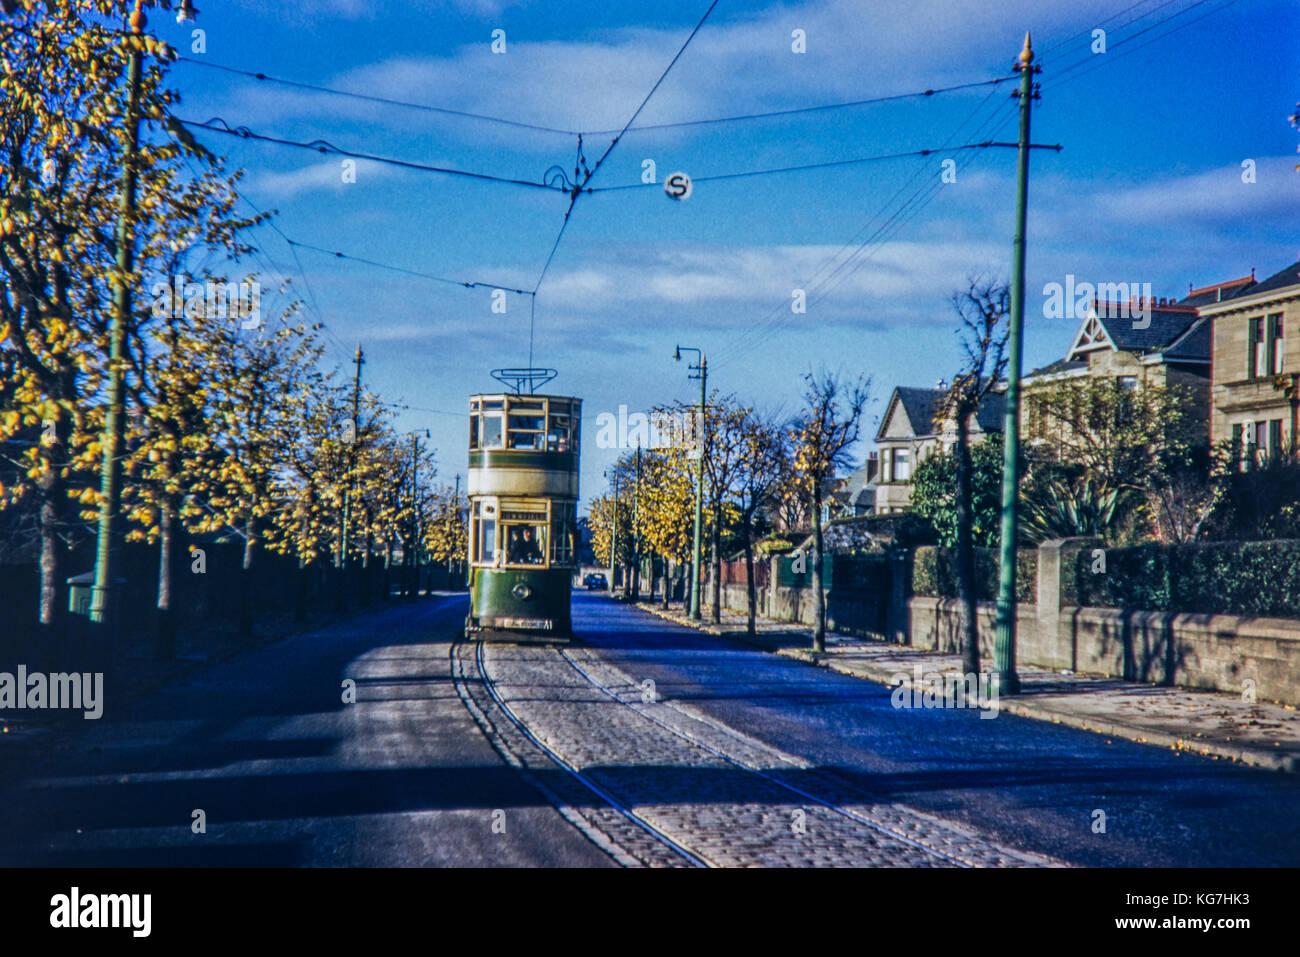 Tram Dundee No.142 Lowfield. Taken in December 1955 - Stock Image